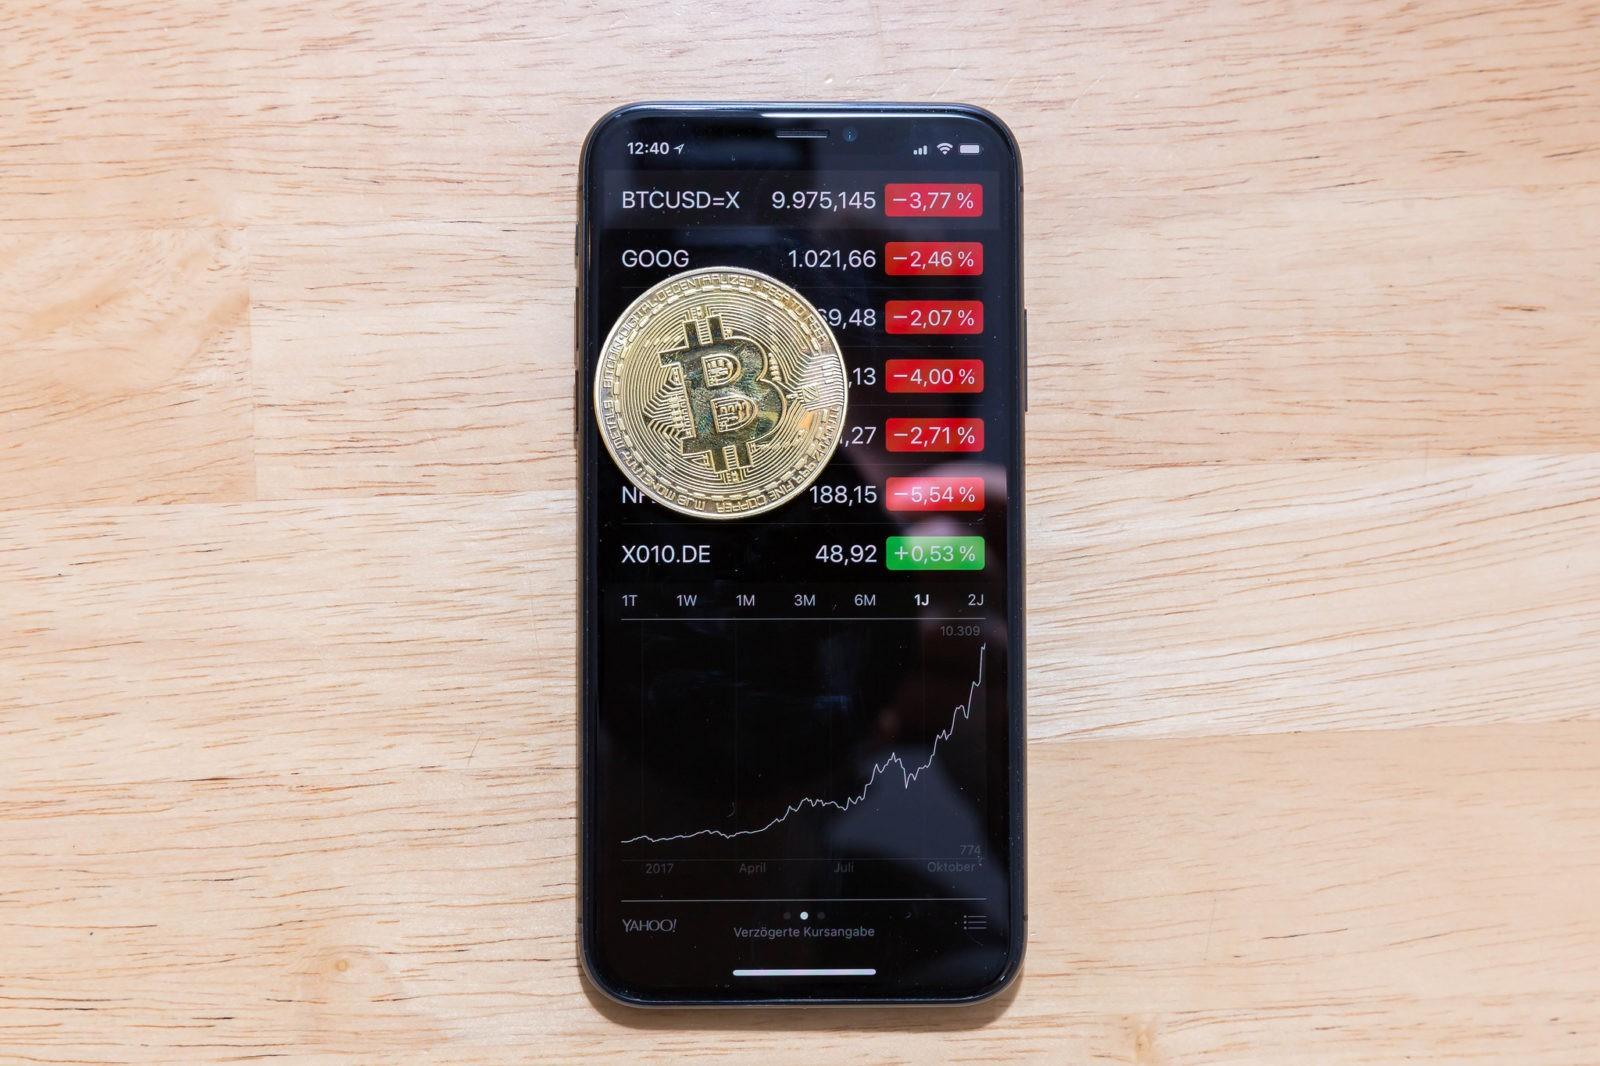 Майнинг криптовалюты на андроиде без вложений биржа криптовалют poloniex на